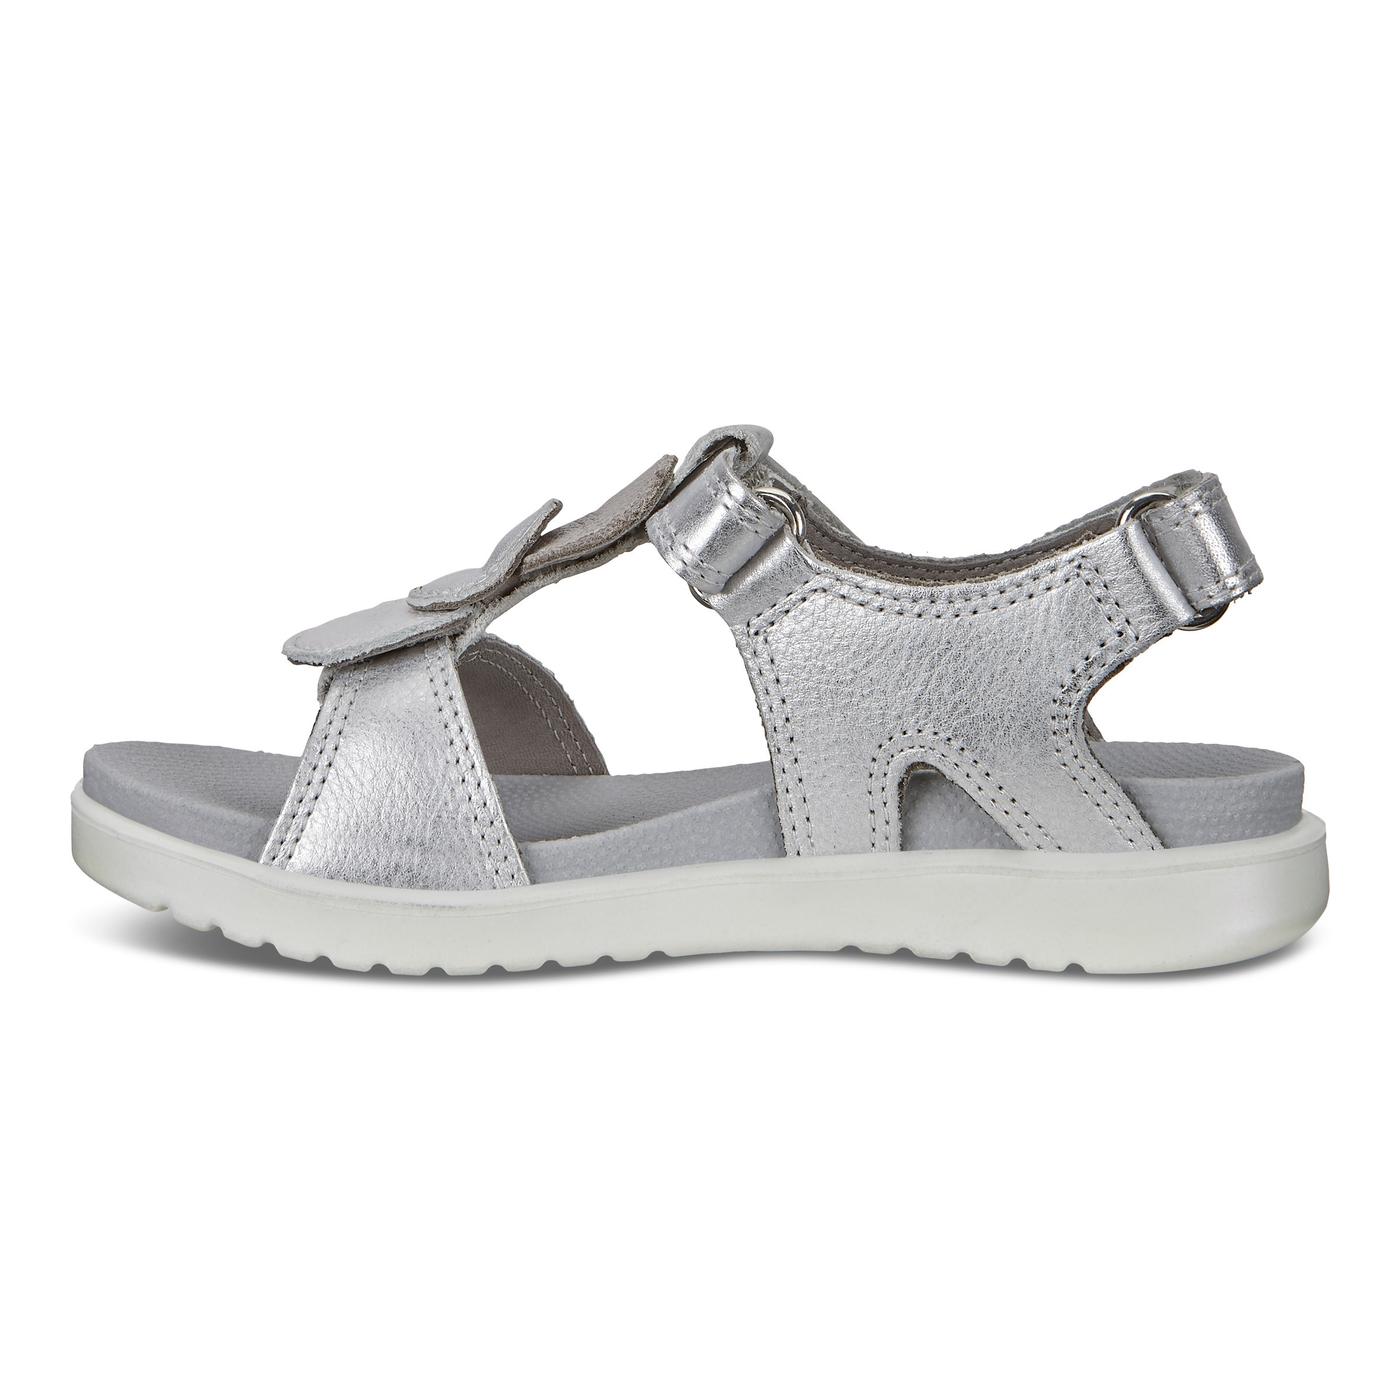 ECCO FLORA Flat Sandal